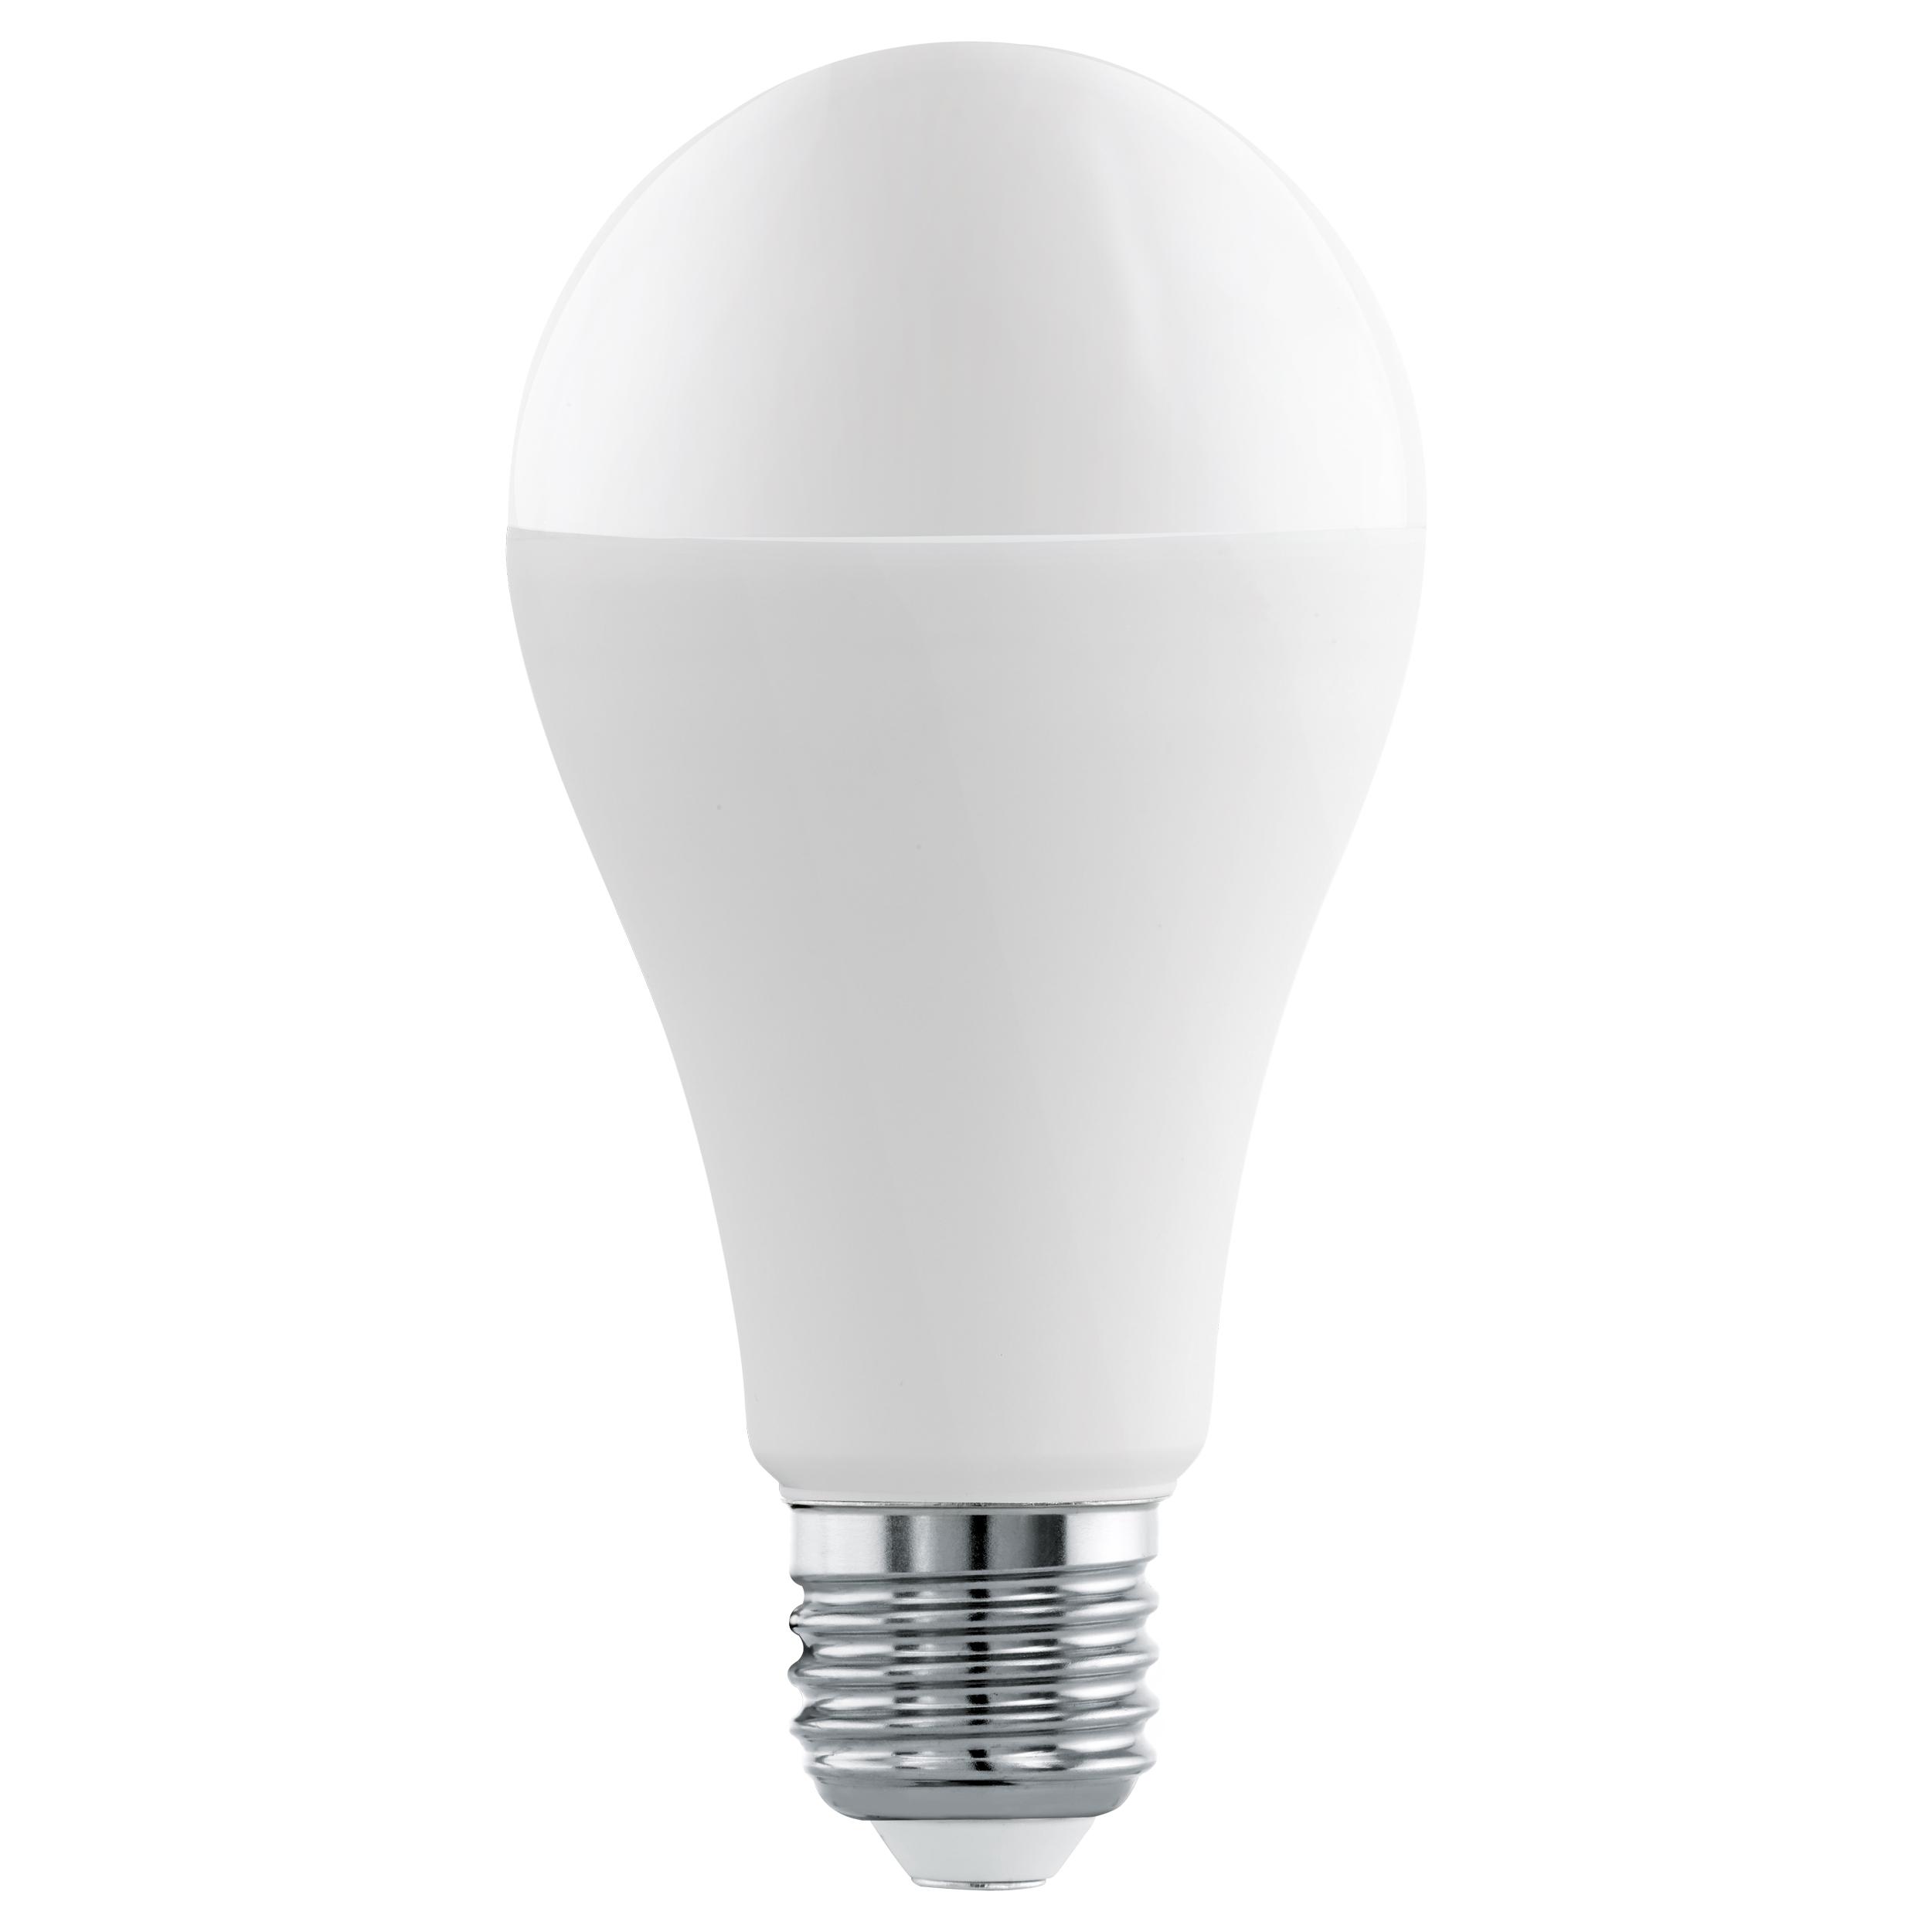 Bec LED Eglo 11564 E27 16W 1521 lumeni 4000K 15.000 ore alb neutru imagine sensodays.ro